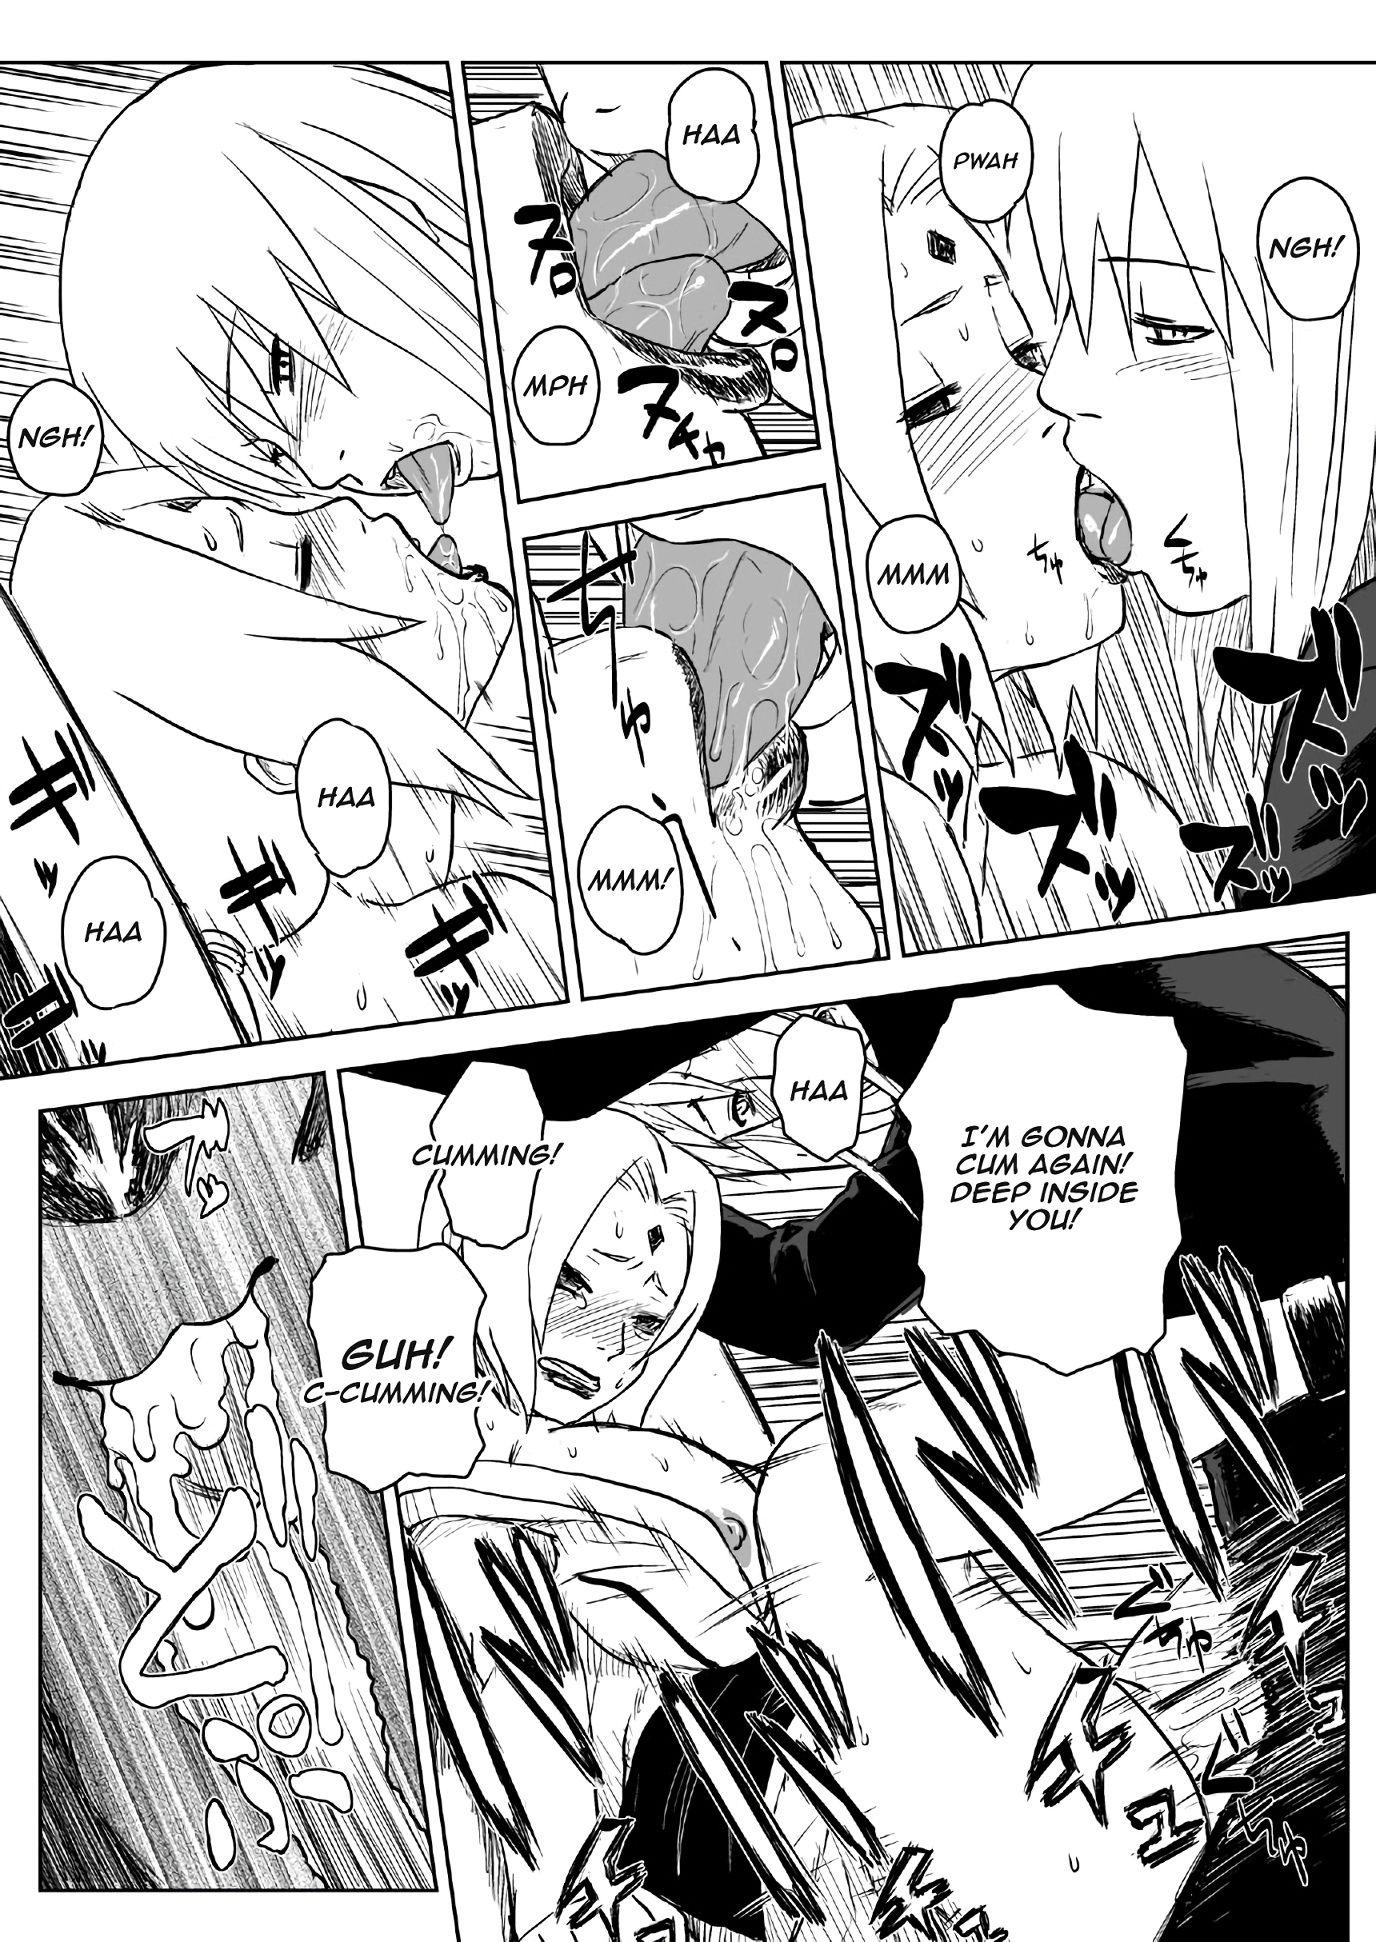 Ninja dependence vol. 5 hentai manga picture 8